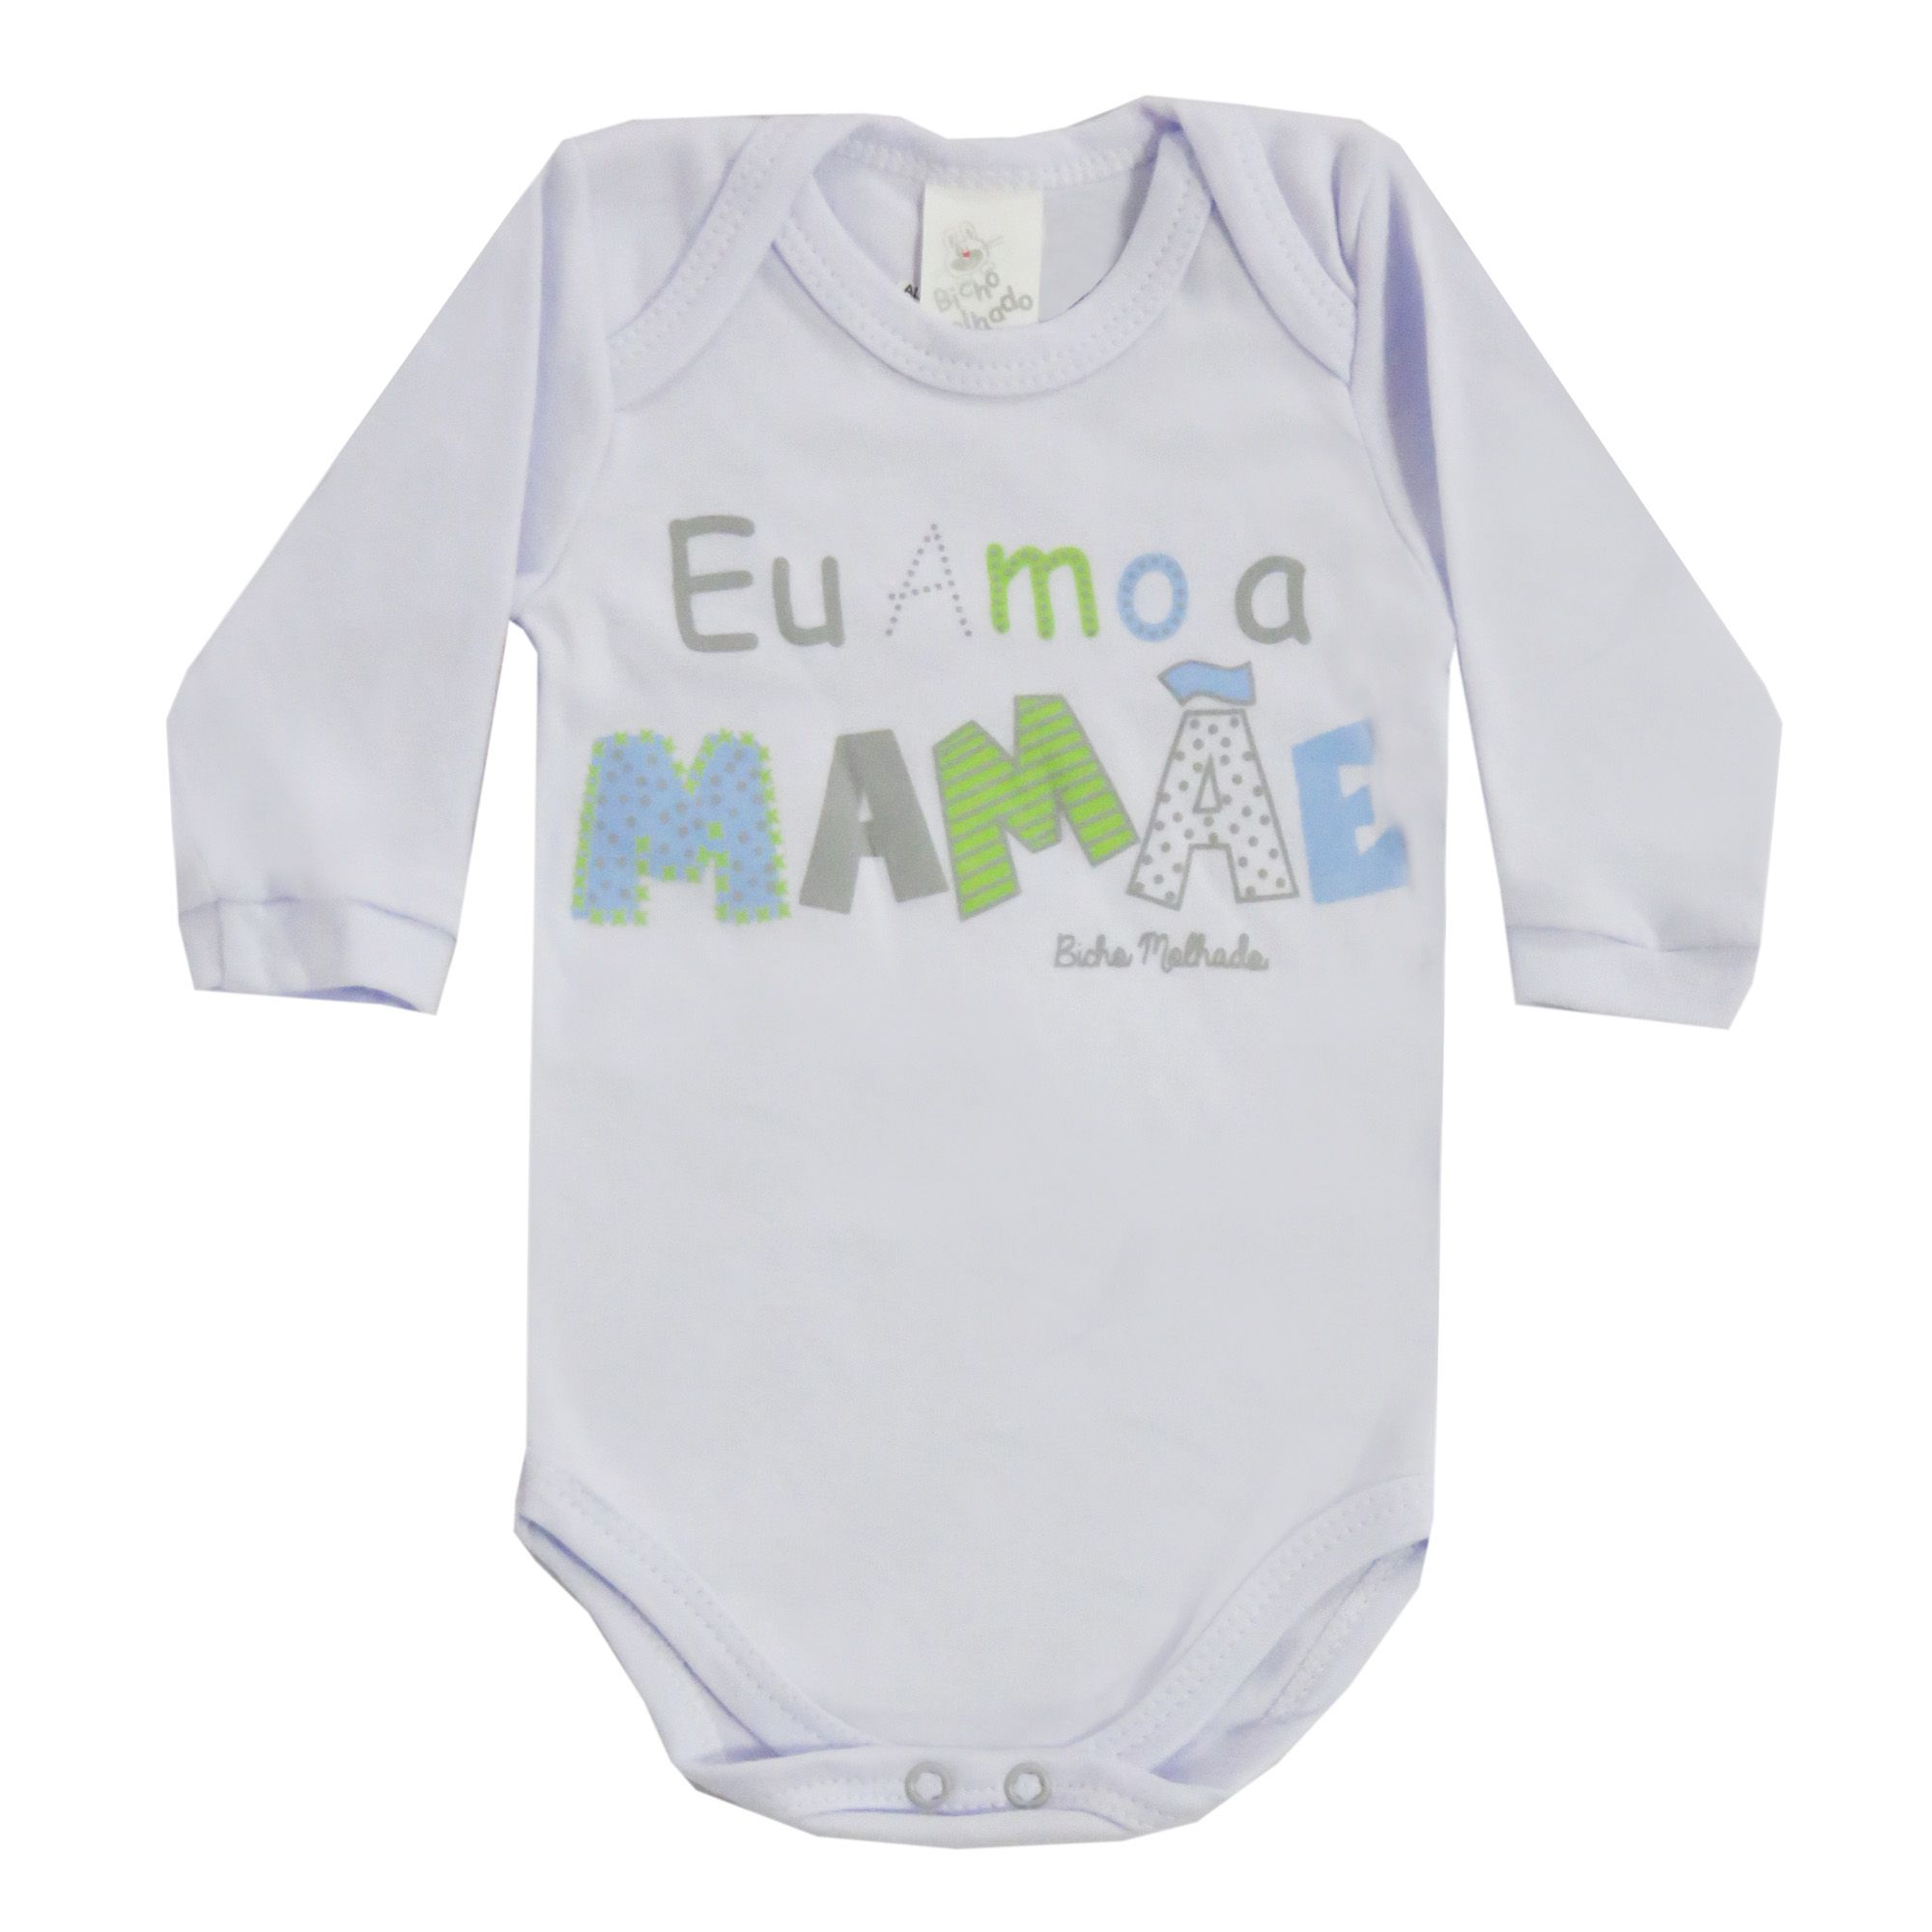 Body Manga Longa Bicho Molhado Frases Eu Amo a Mamãe - RN ao G